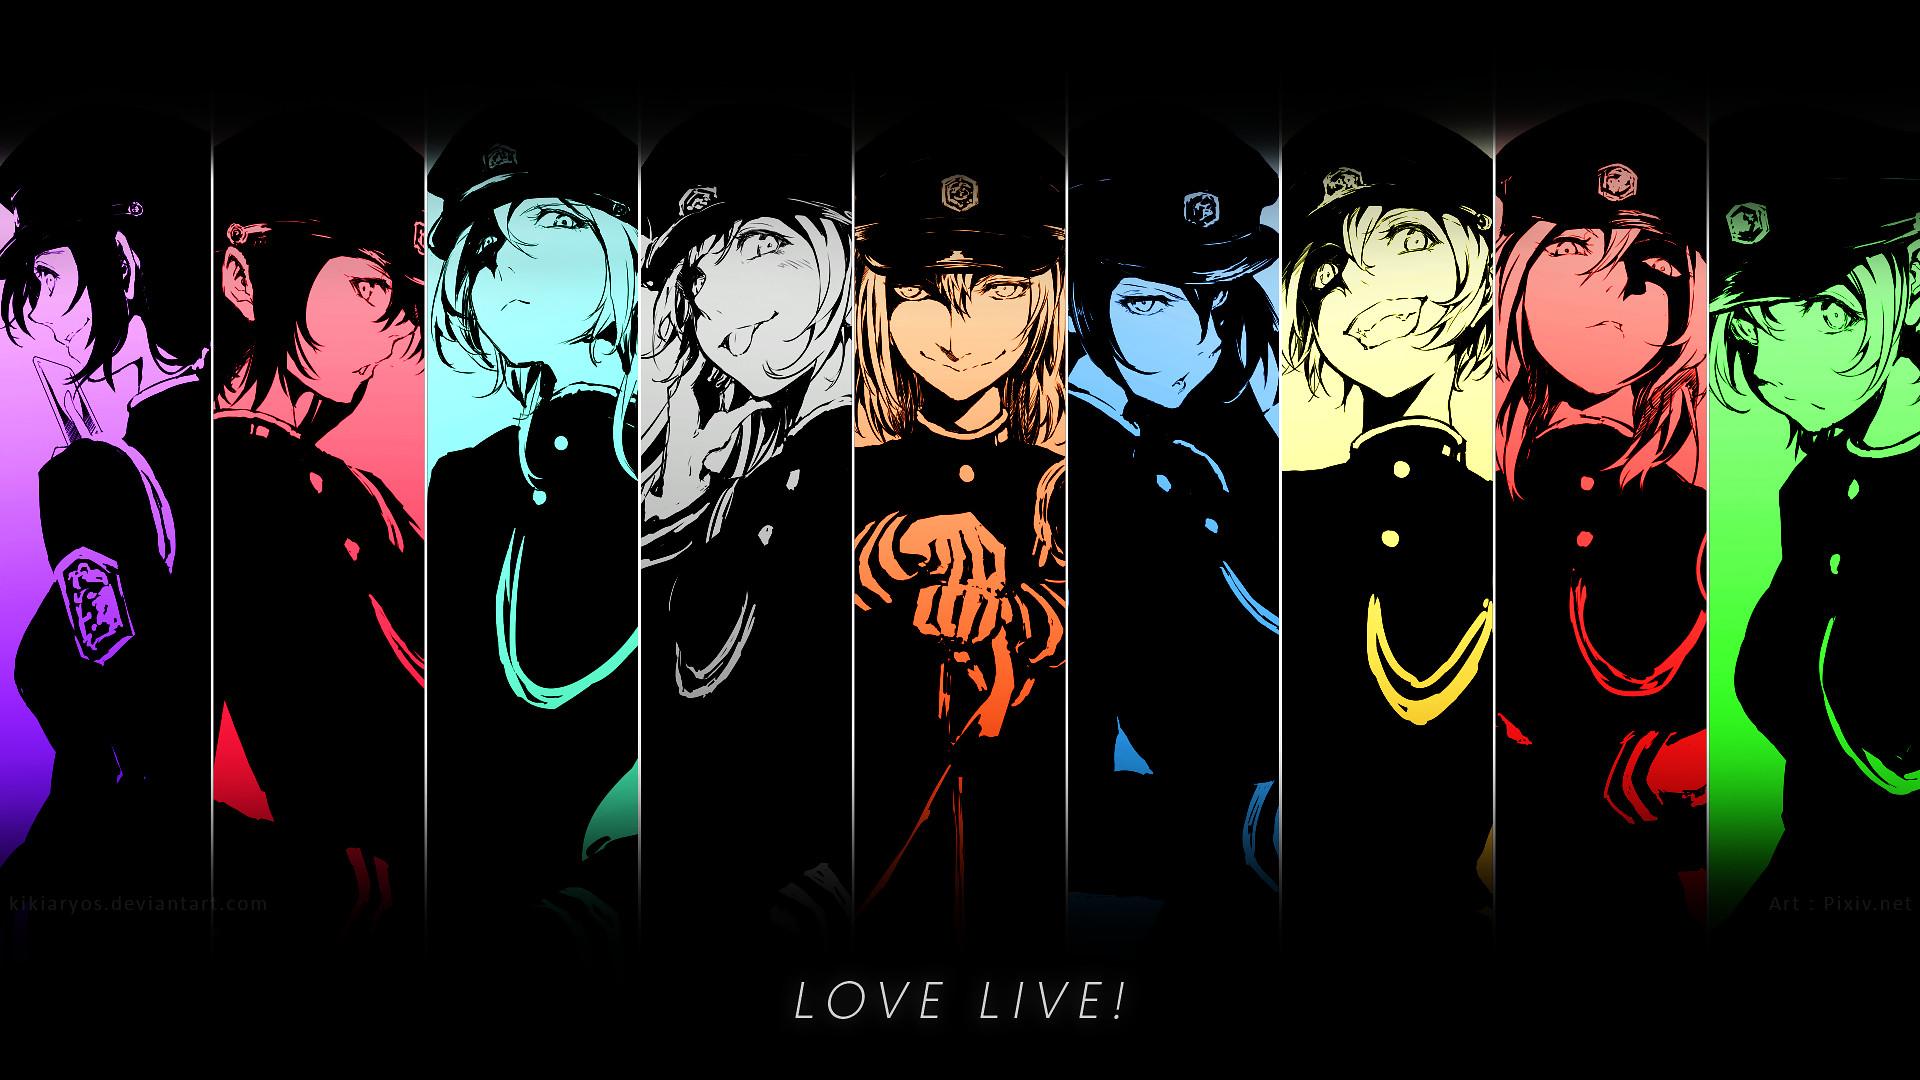 love live wallpaper images (2)